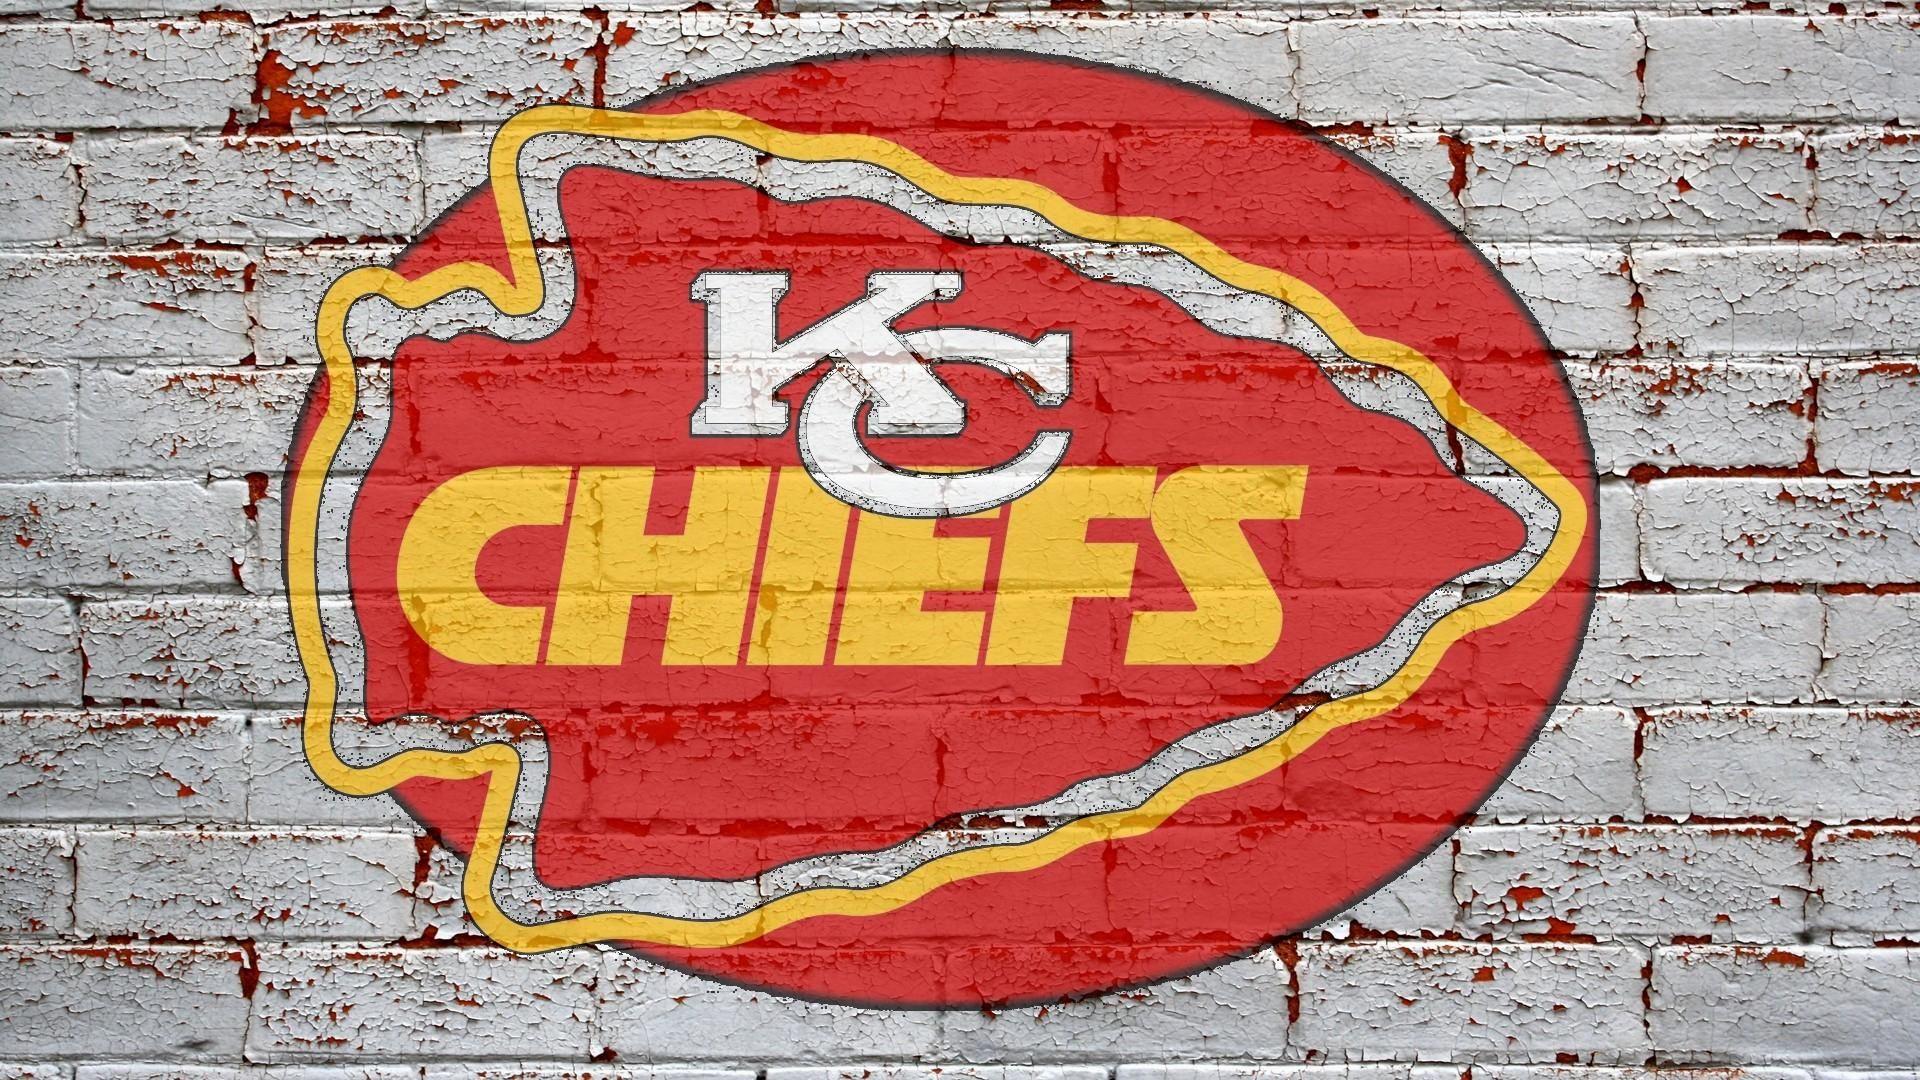 Chiefs Wallpapers 640 960 Chiefs Wallpapers 36 Wallpapers Adorable Wallpapers Chiefs Wallpaper Kansas City Chiefs Logo Chiefs Logo